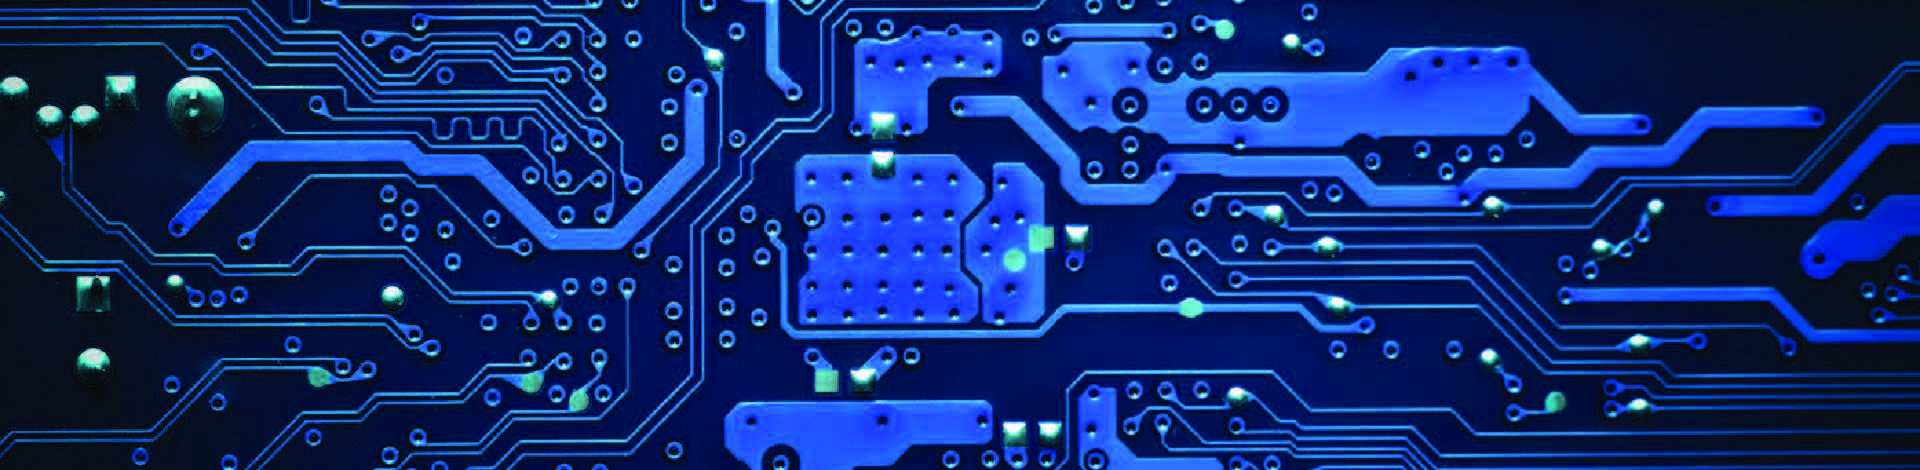 Embedded Automotive